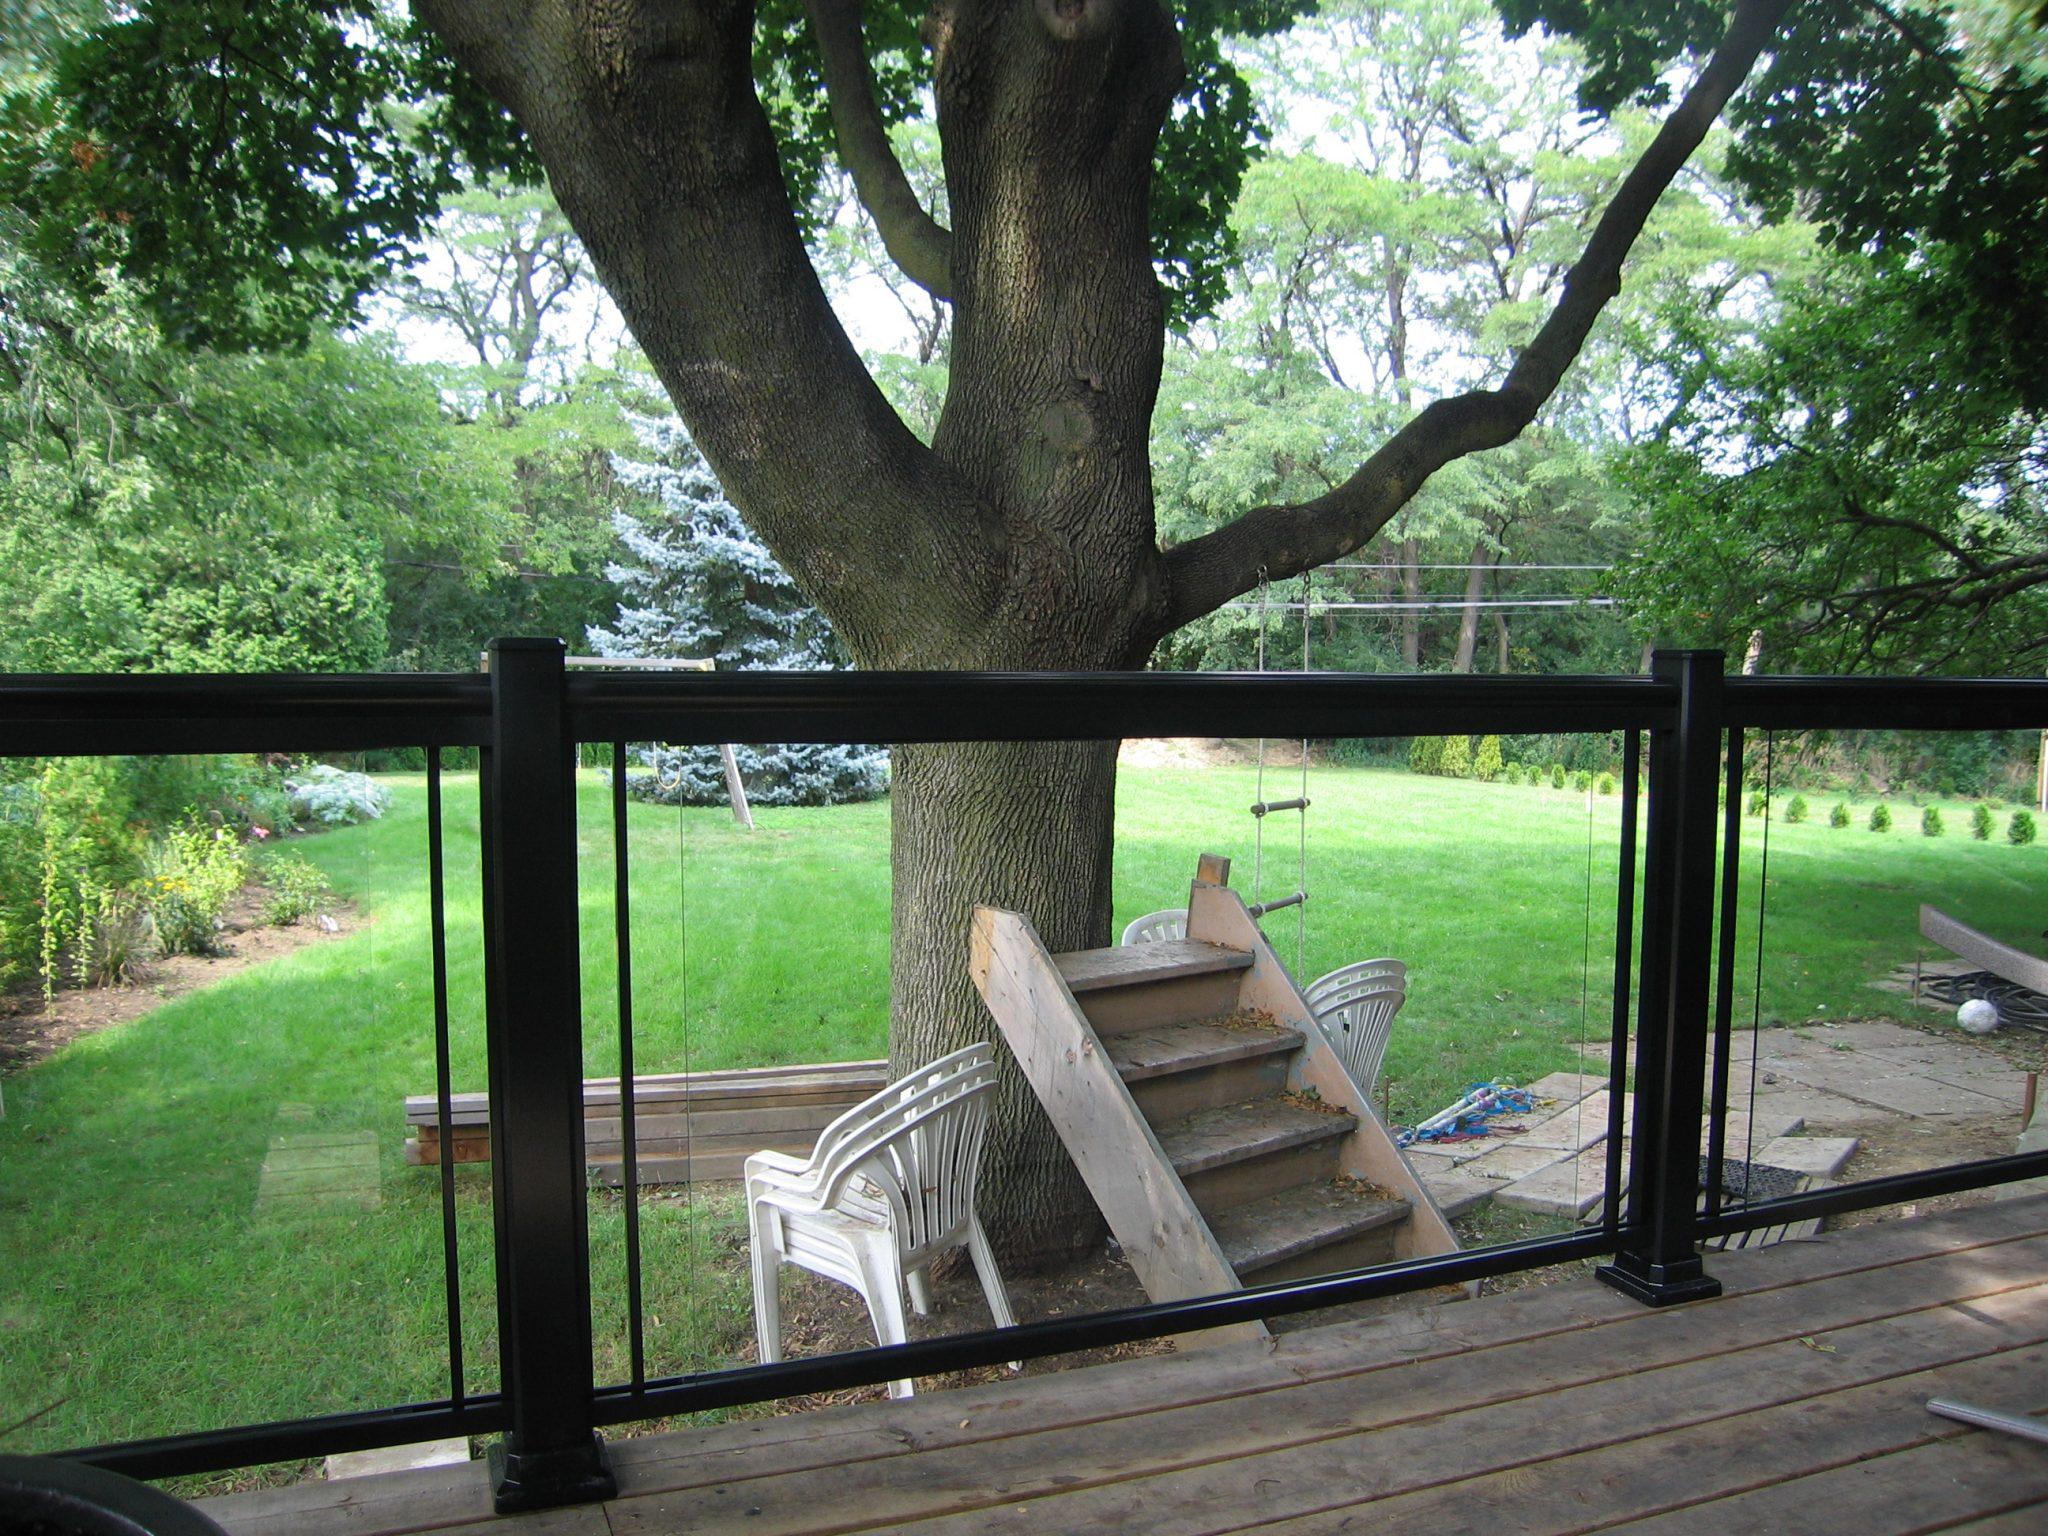 Backyard with large tree